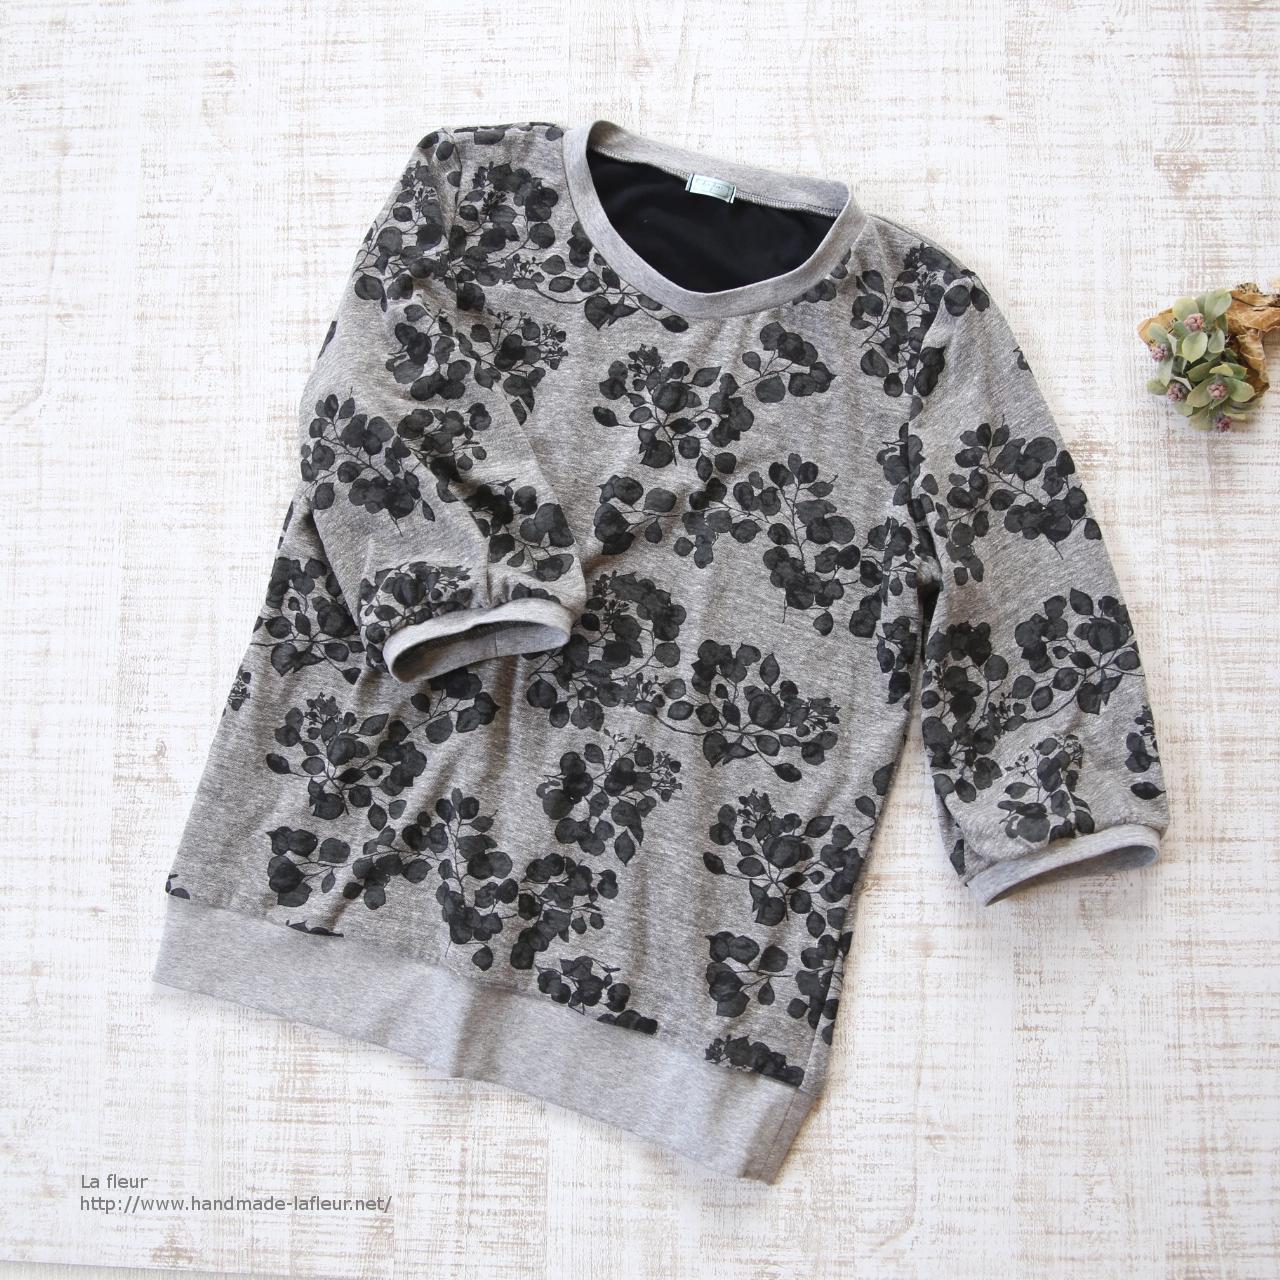 【L】七分袖プルオーバー*カットソー 黒×グレー 植物・花柄/Lafleur